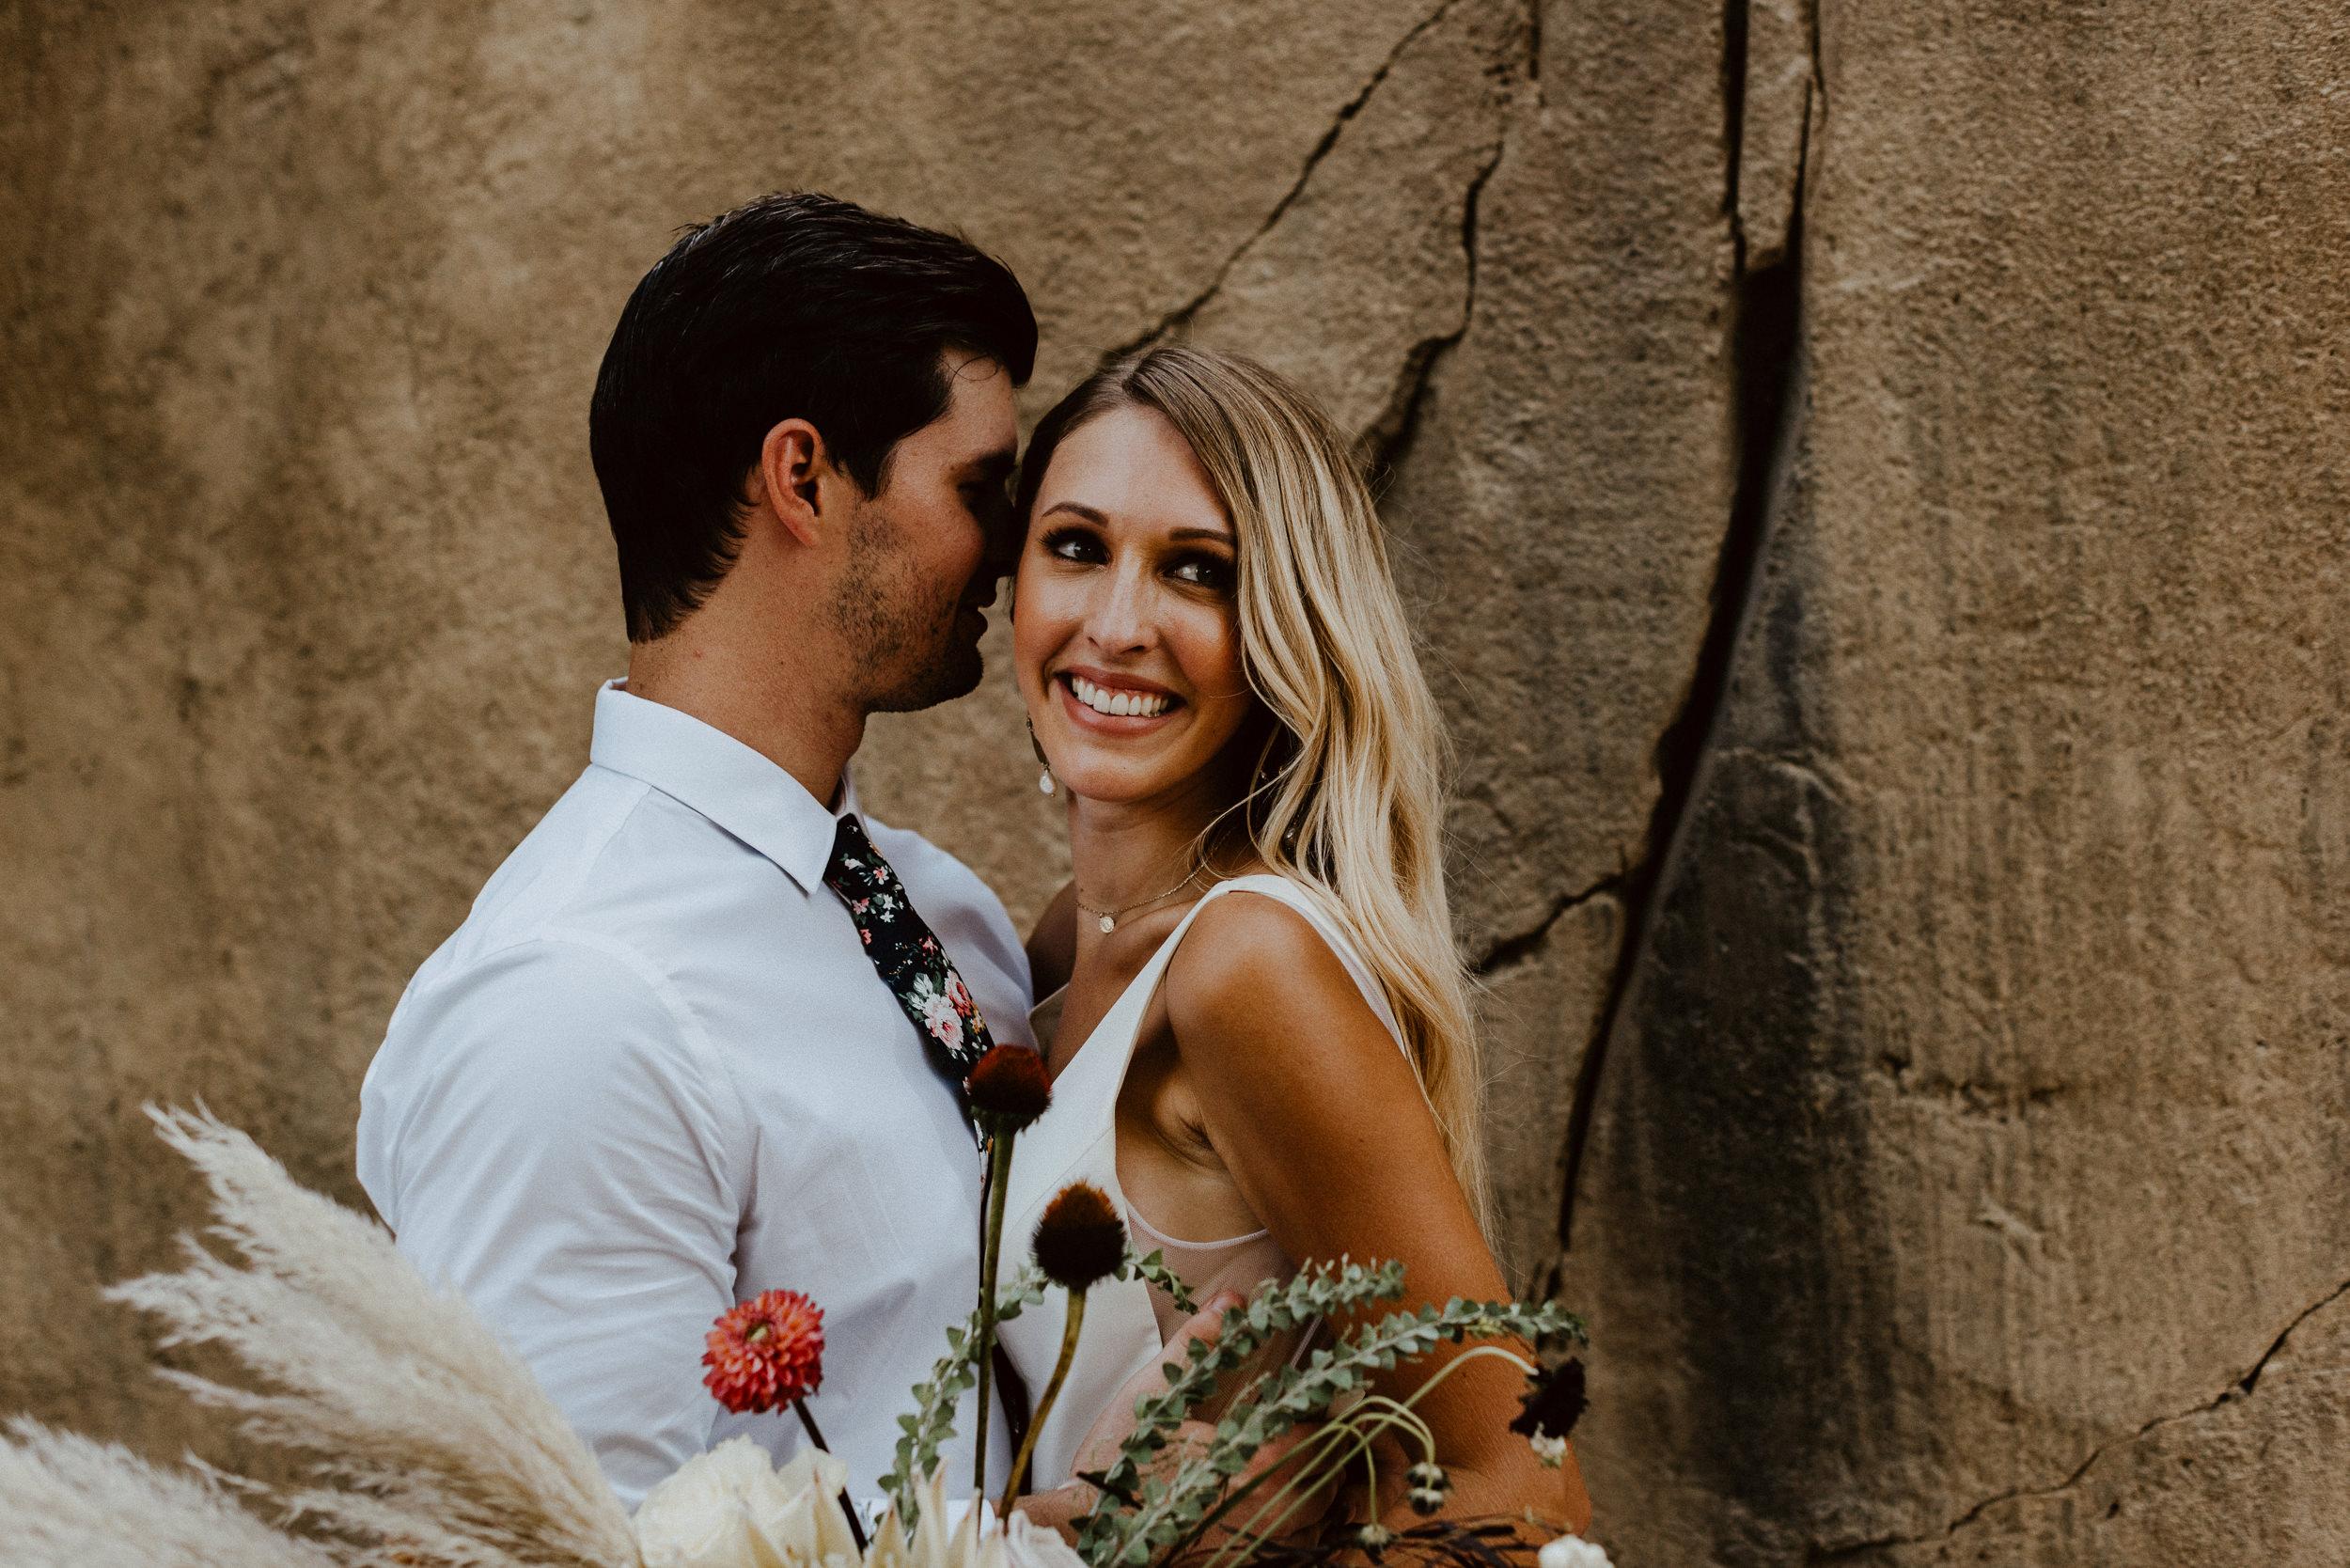 sChelsie + Chris - The Desert Shootout Wedding Romantics at The Living Desert-120.jpg